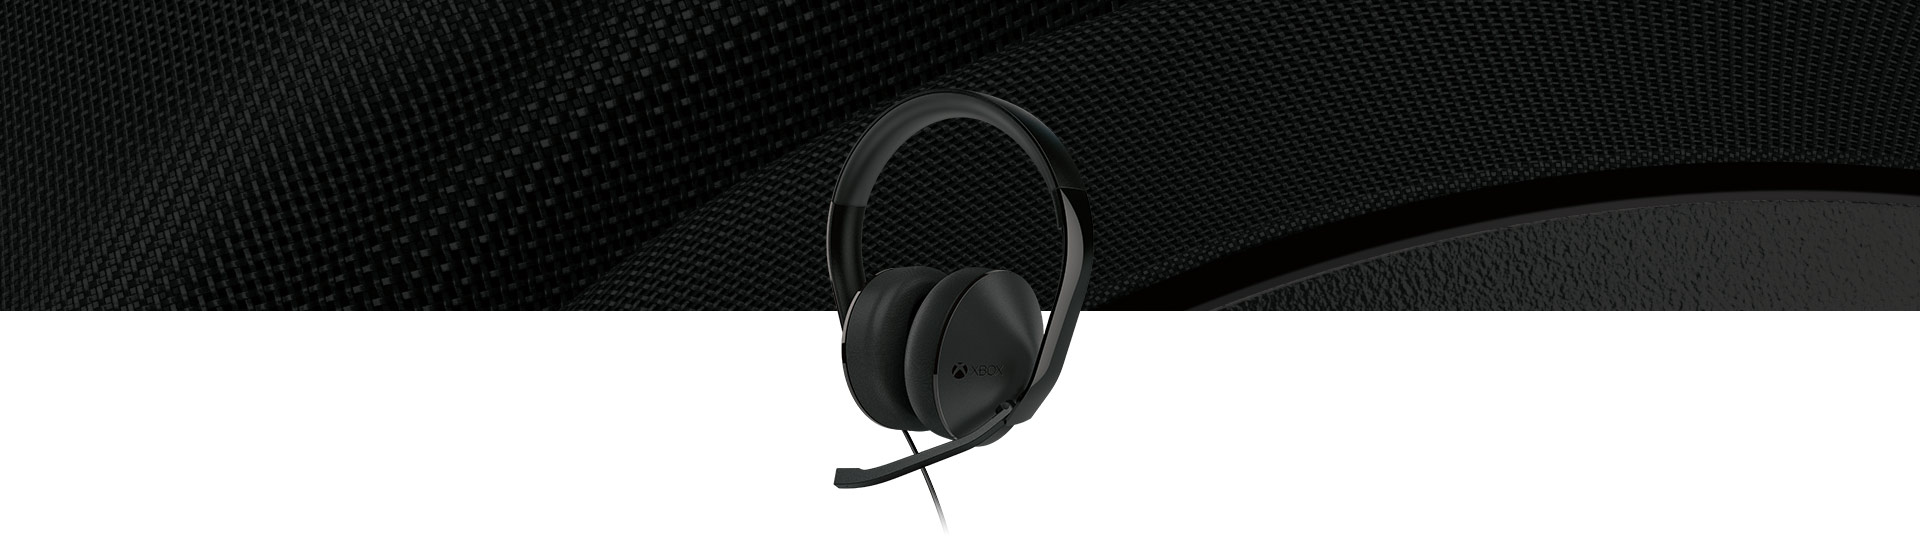 xbox one stereo headset [ 1920 x 540 Pixel ]